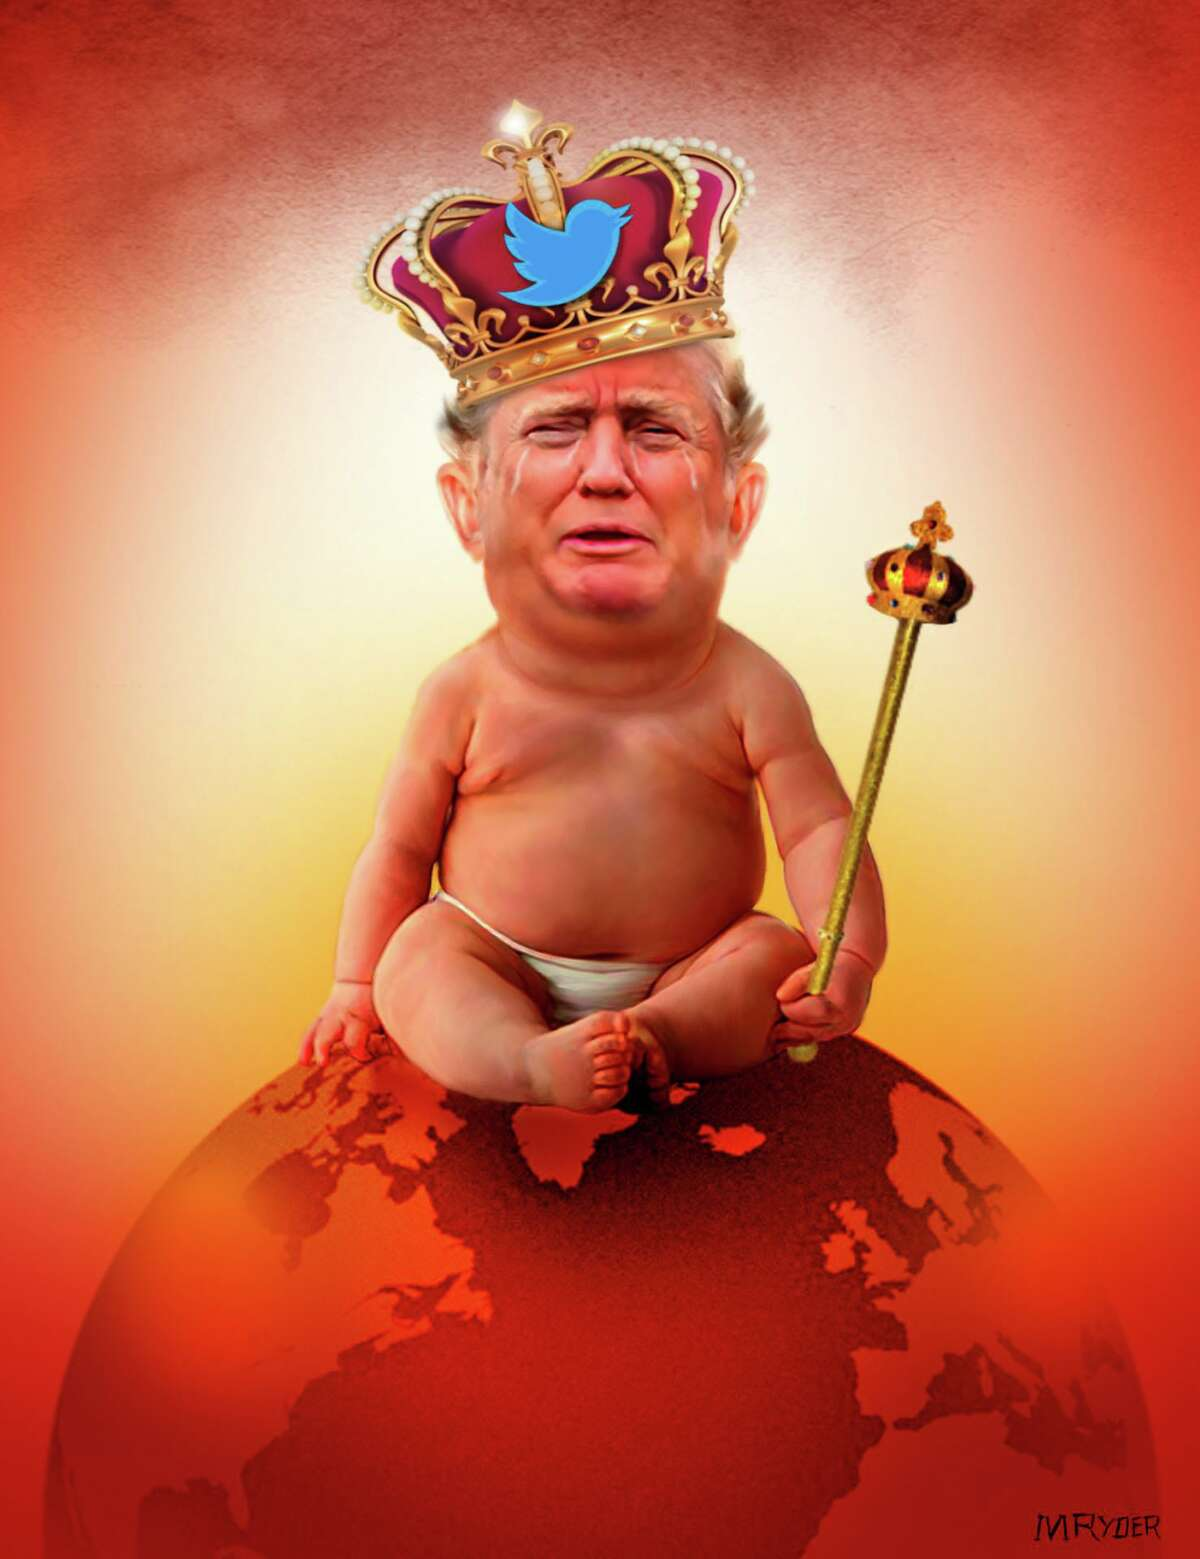 M. Ryder illustration on Donald Trump's Twitter rants